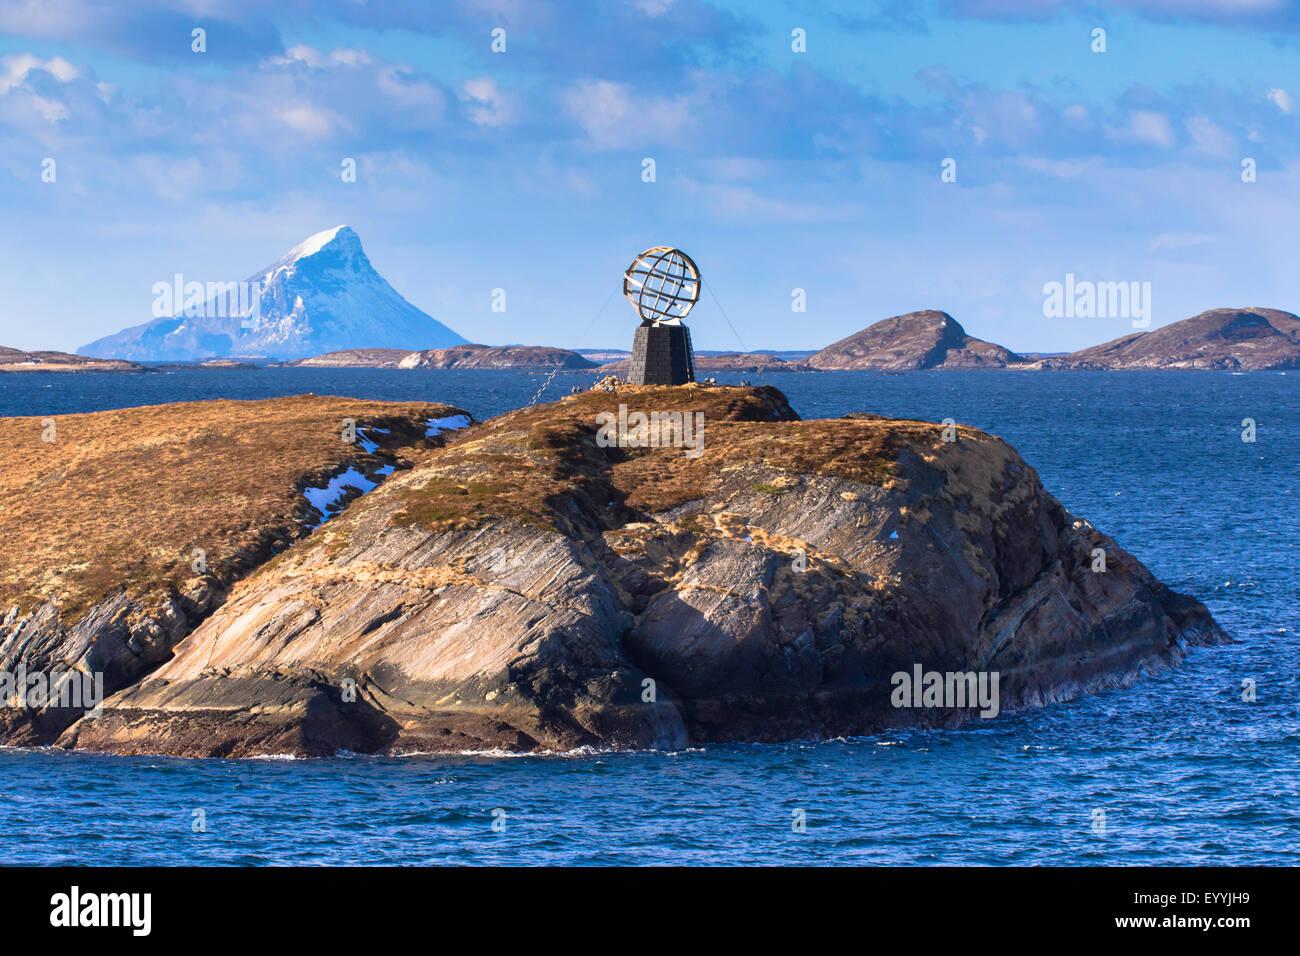 island Vikingen at polar circle, Norway, Nordland, Melfjorden - Stock Image